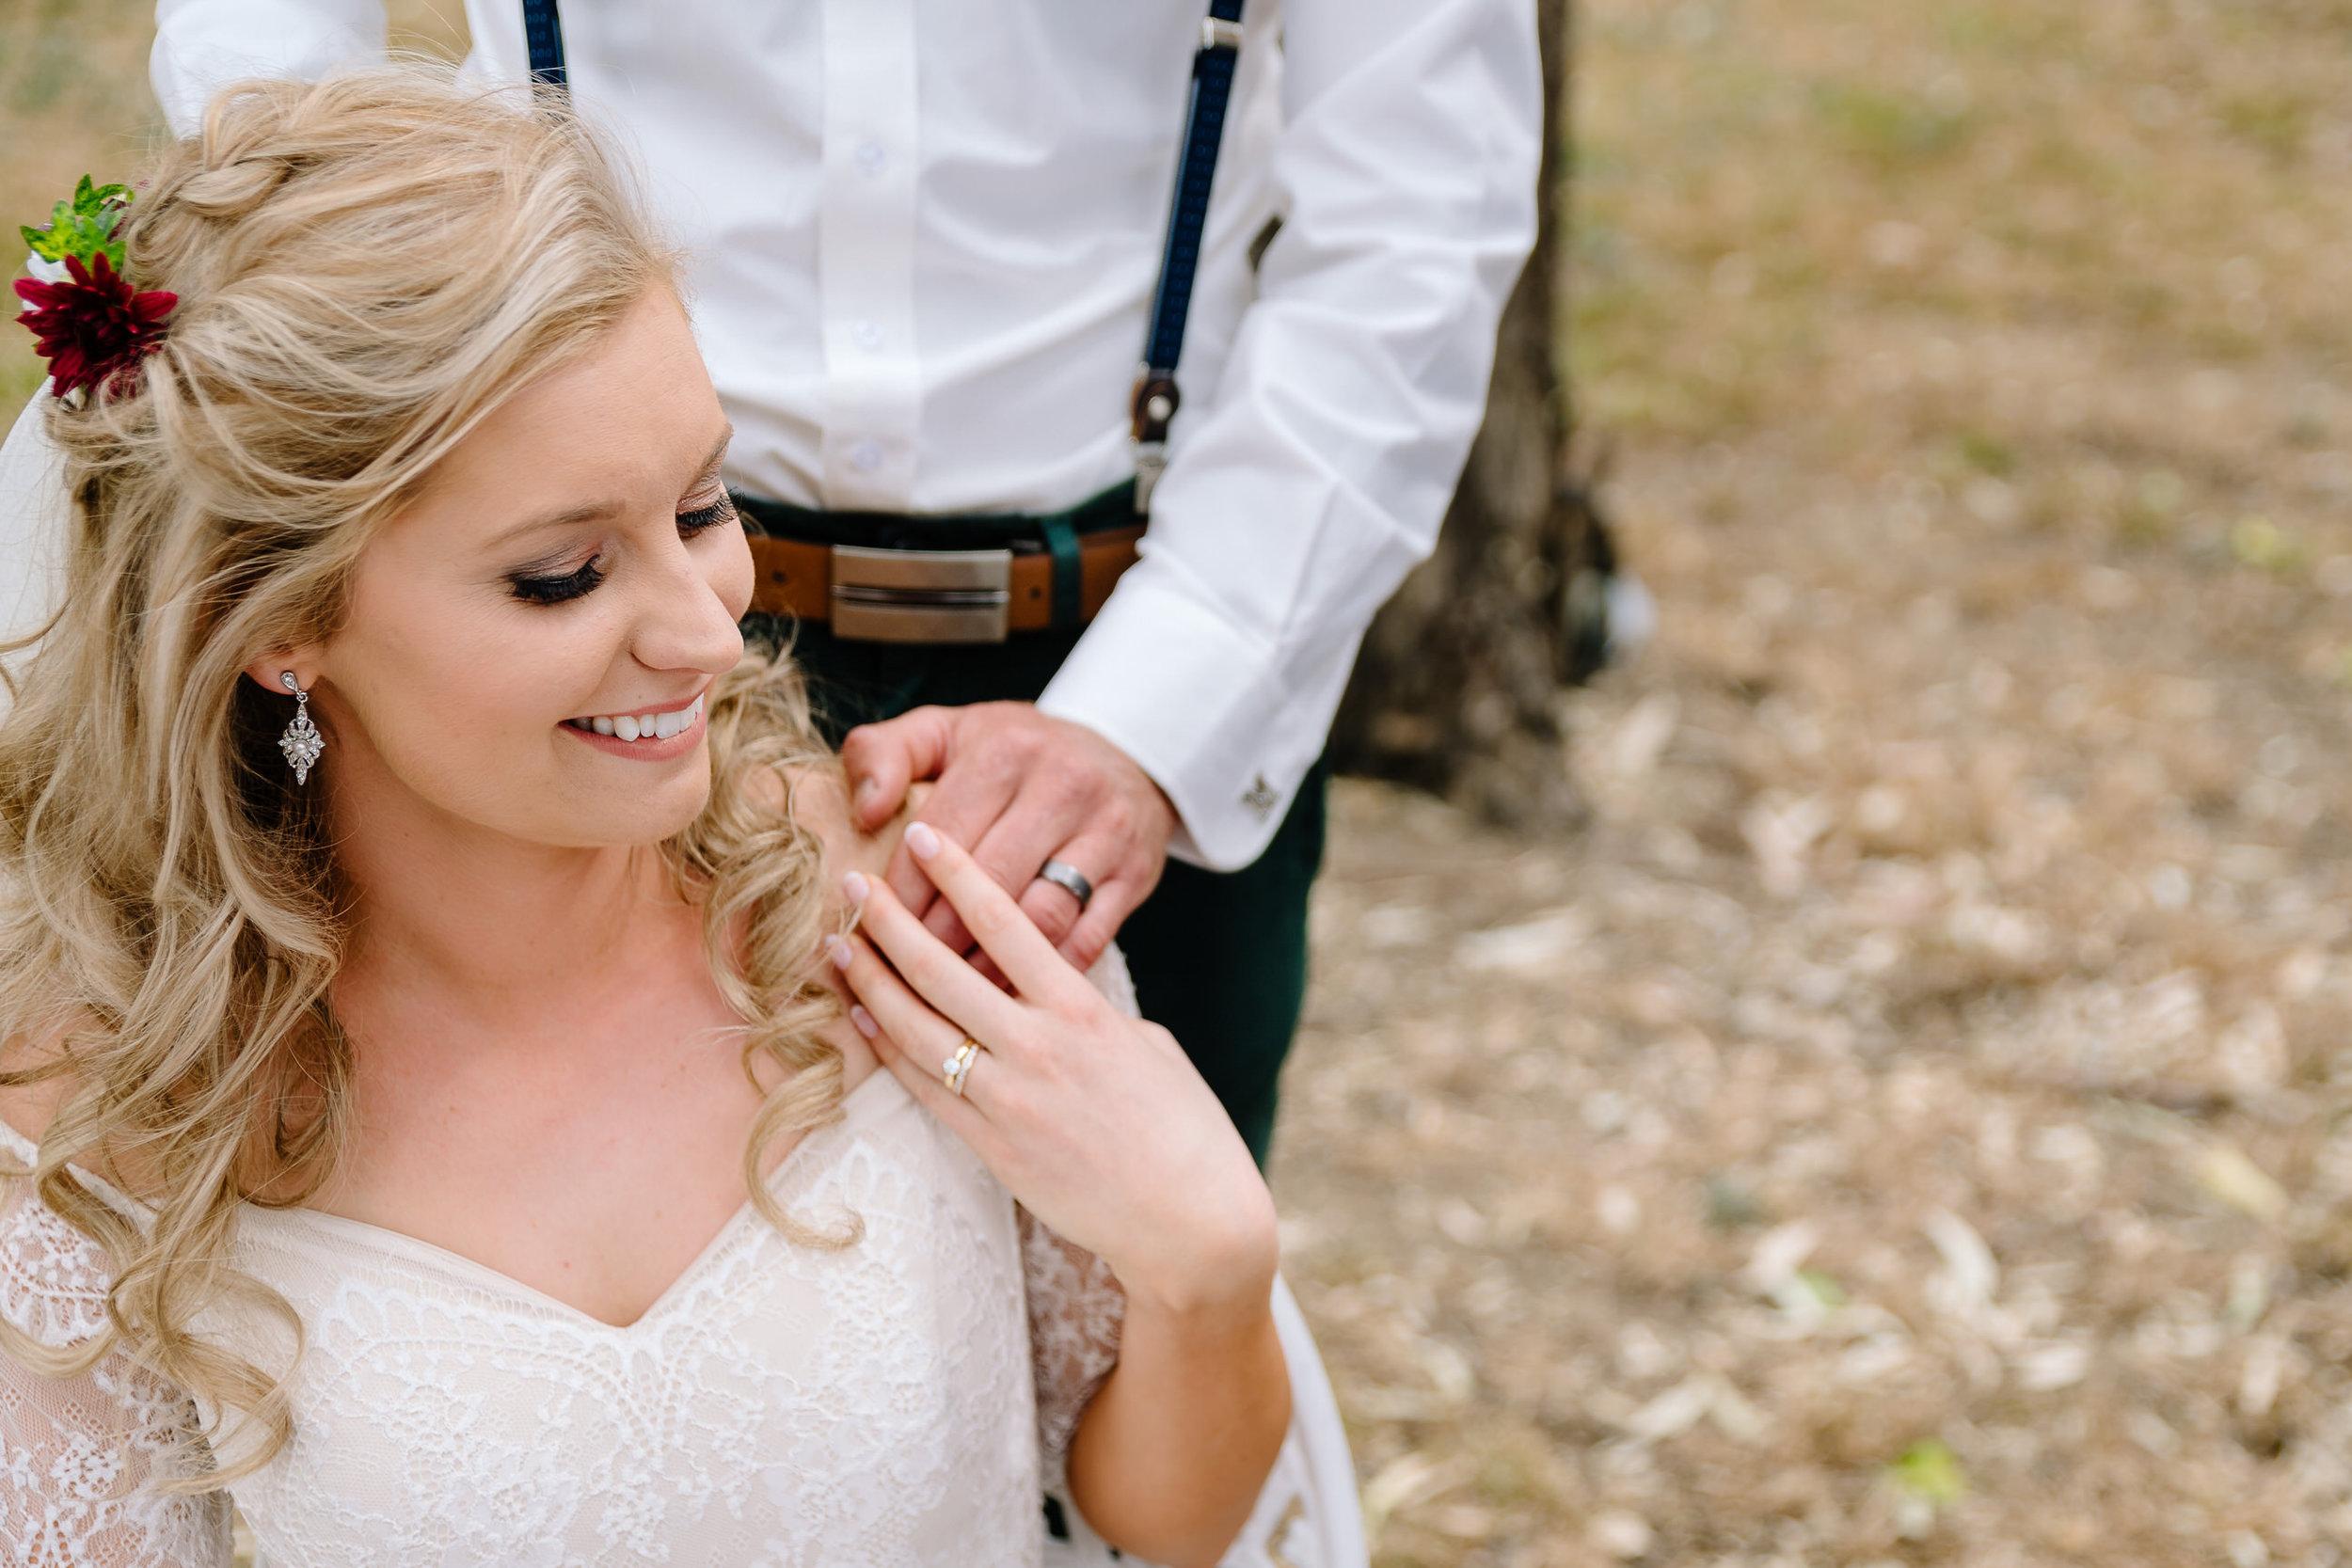 Justin_And_Jim_Photography_Backyard_Wedding180.JPG